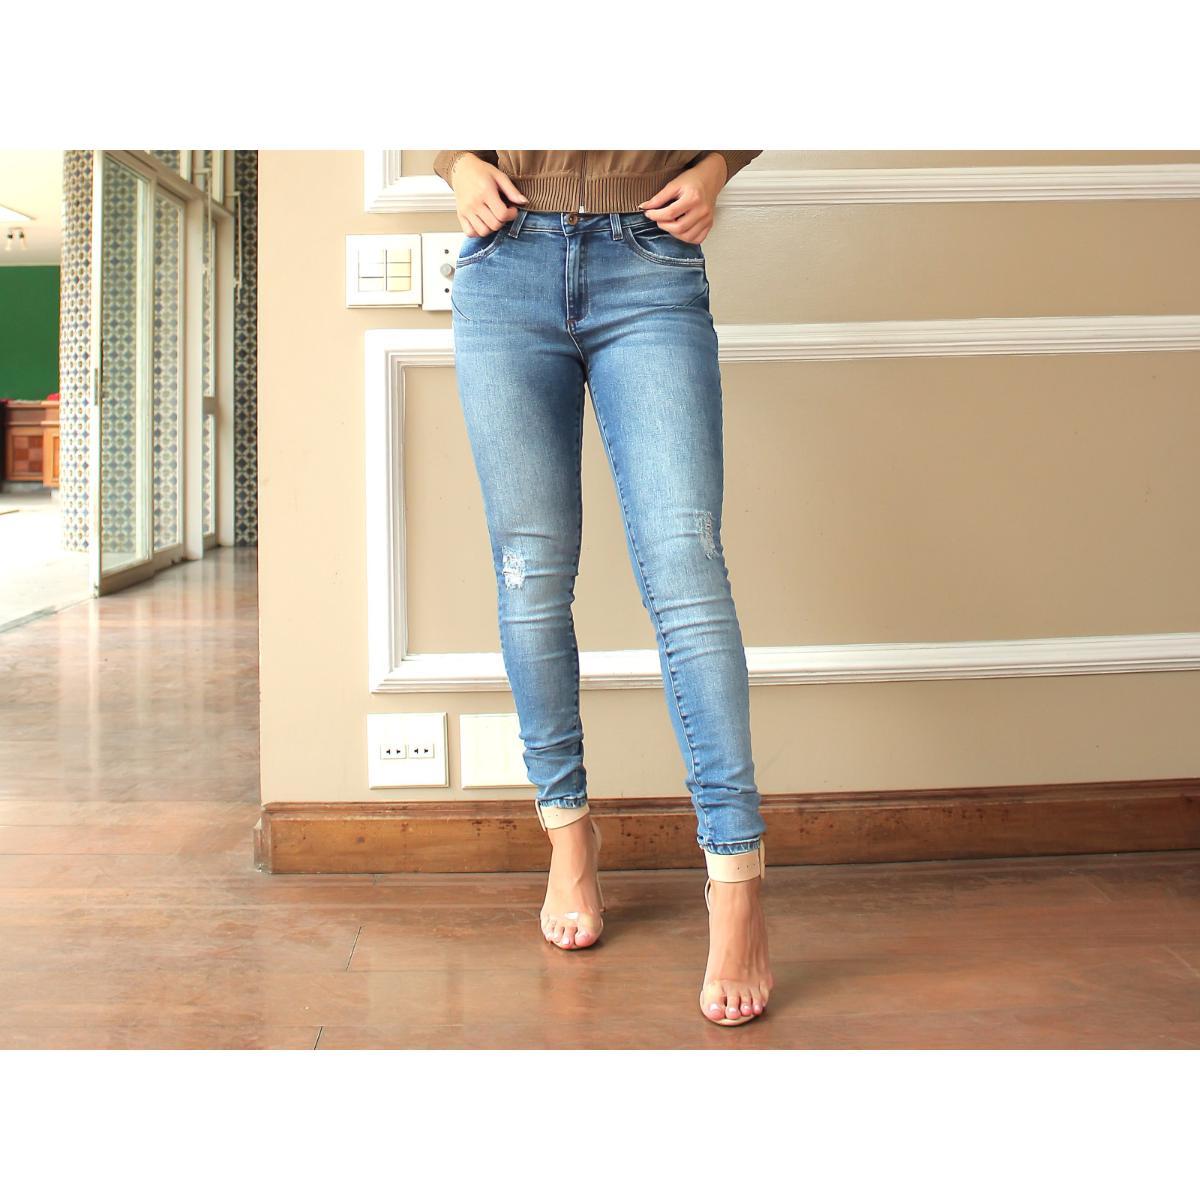 Calça Feminina Index 01.01.004996 Jeans